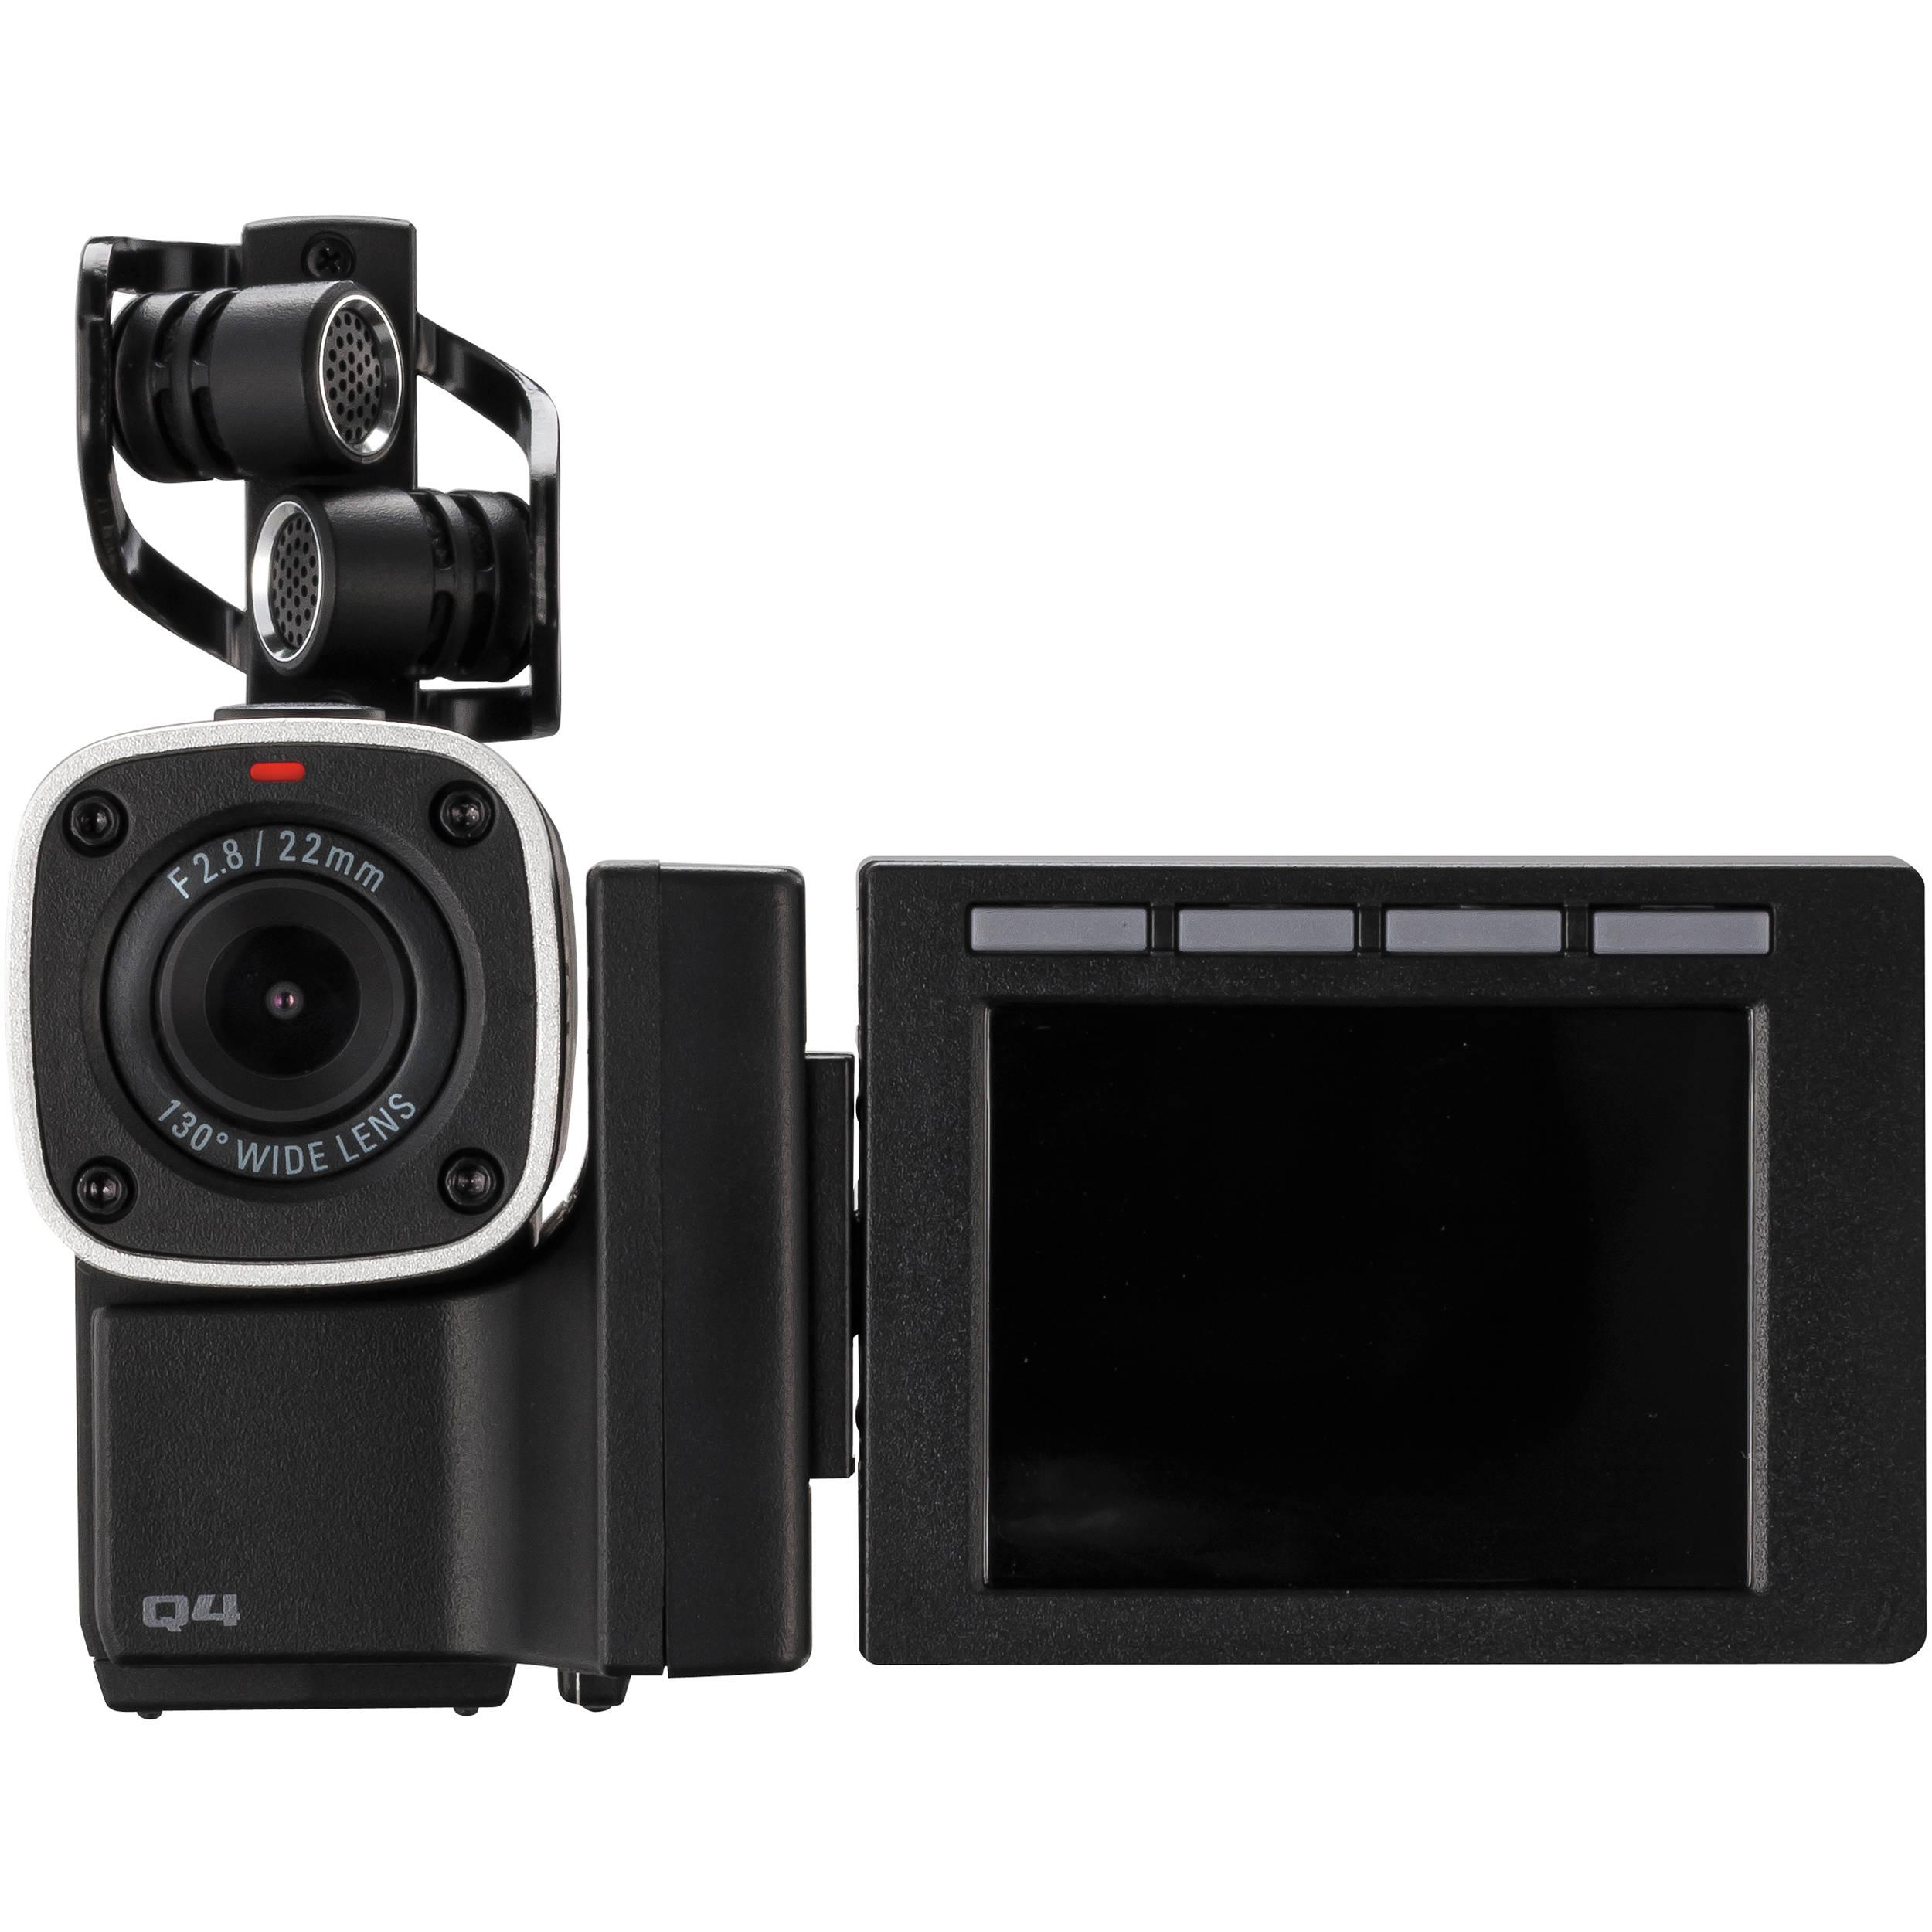 Handy Videos